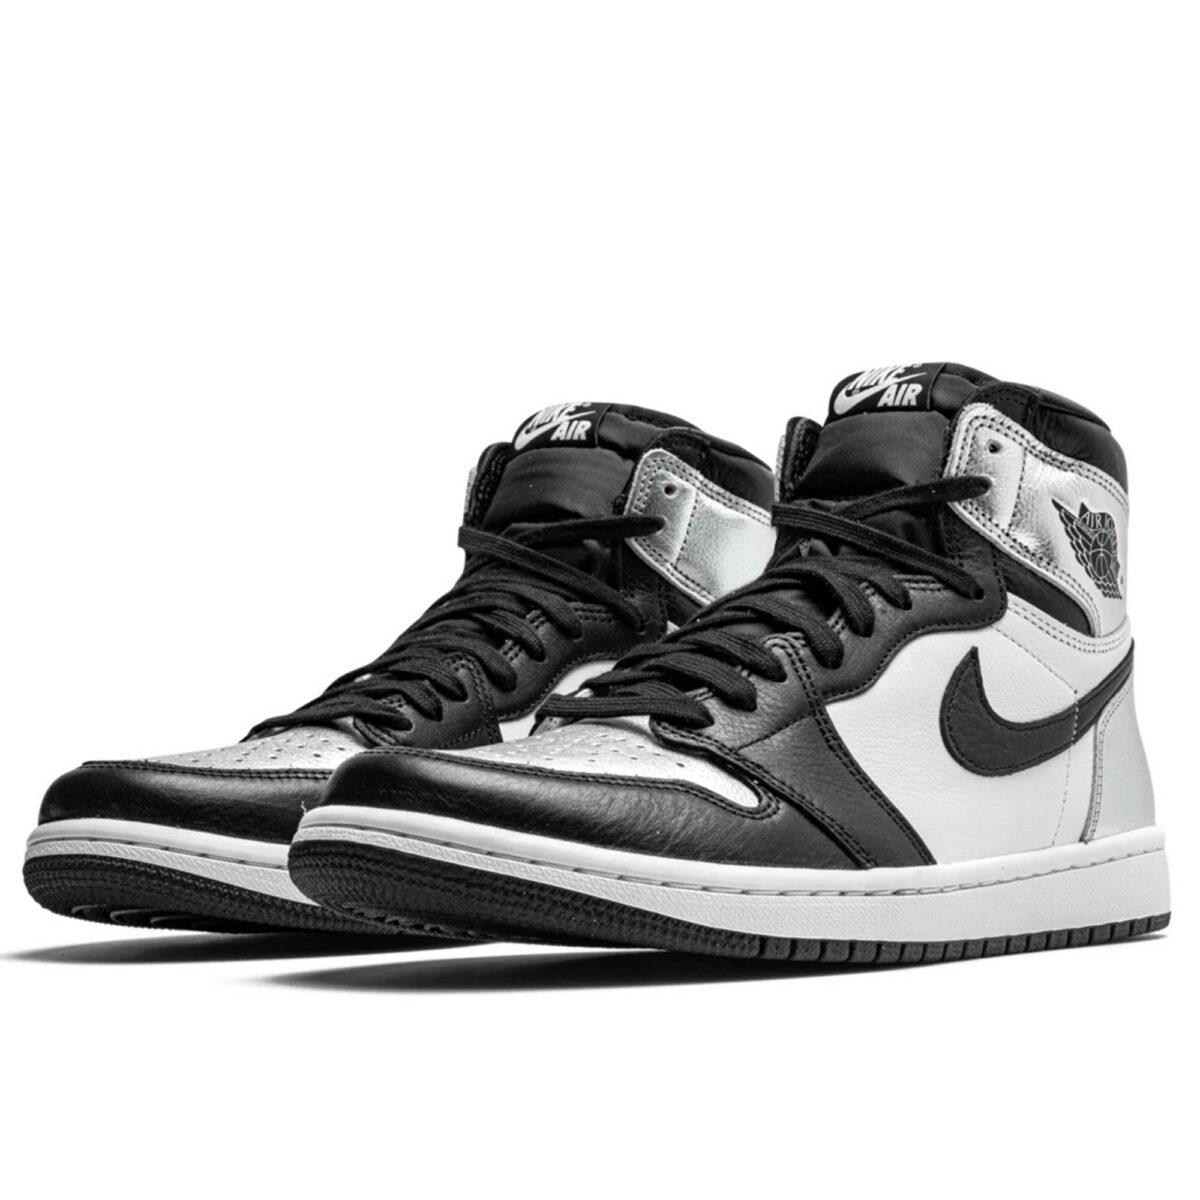 nike air Jordan 1 retro high silver toe CD0461_001 купить